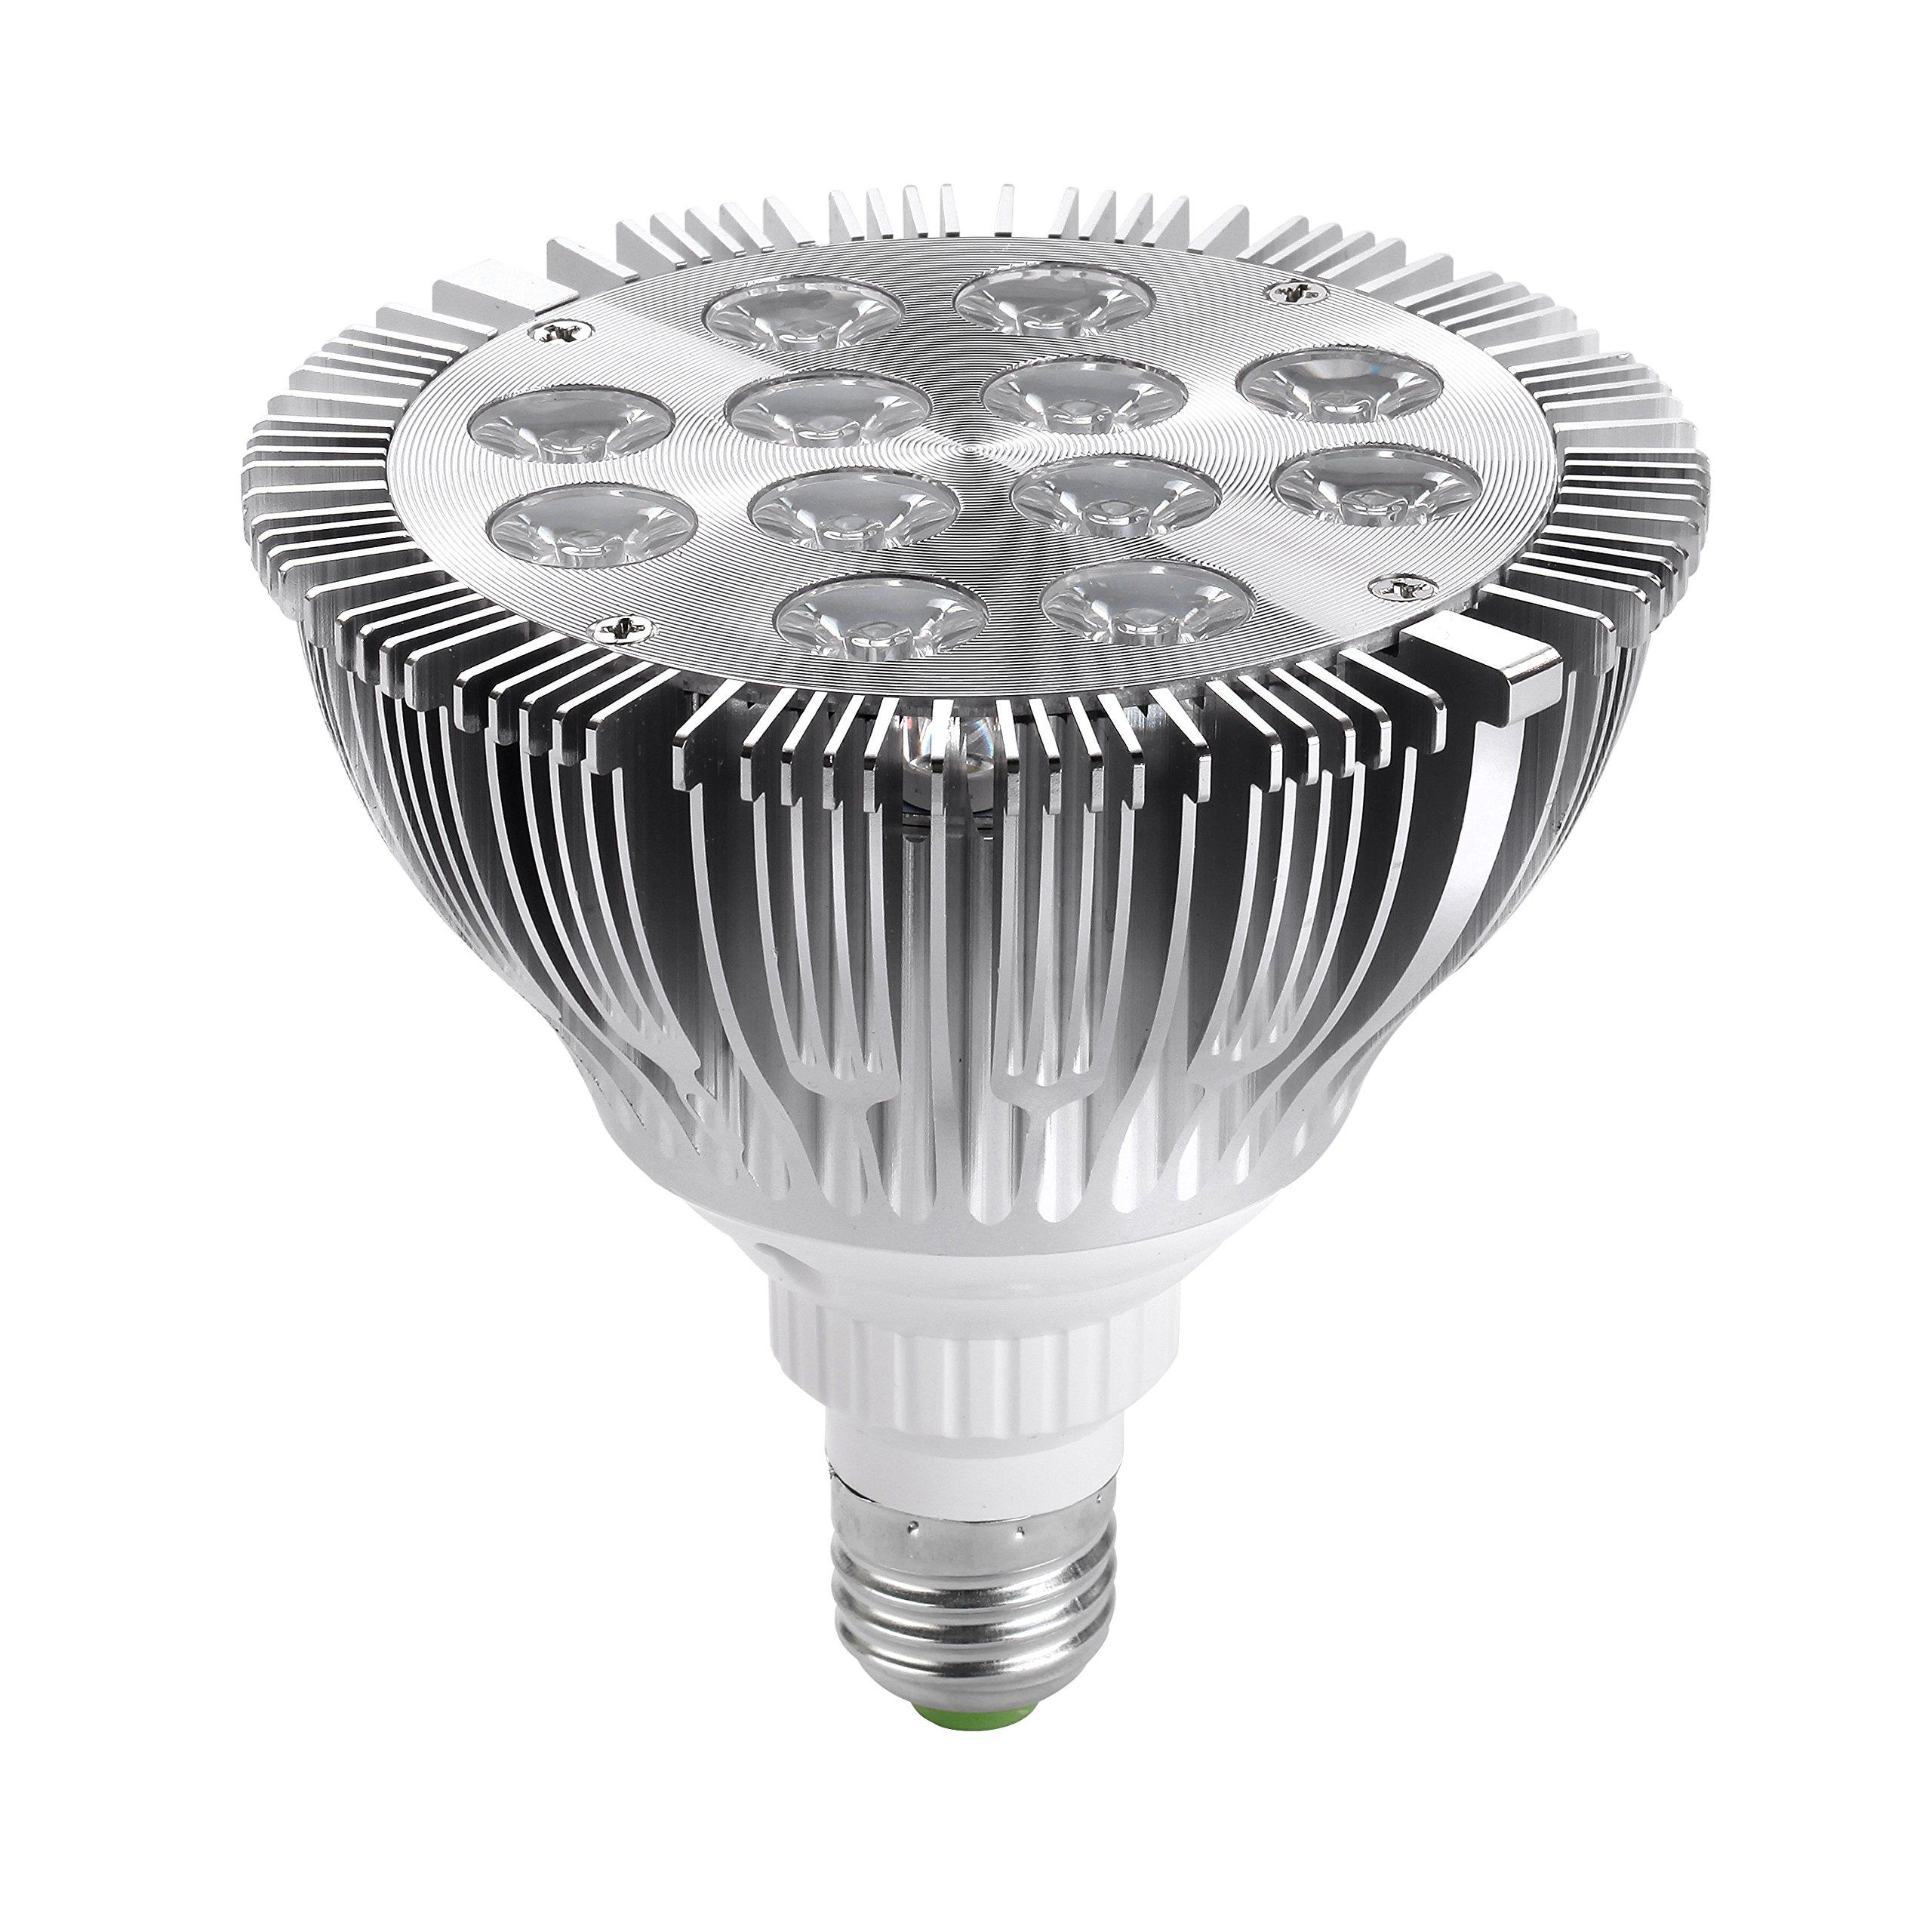 Jinda® PAR 38 Aluminum 12W E27 LED Cold White Spot Light Bulb High Power Lamp 30 Degree Beam Angle Electricity-saving Lamp (85~265V Ac) (12 Watts)